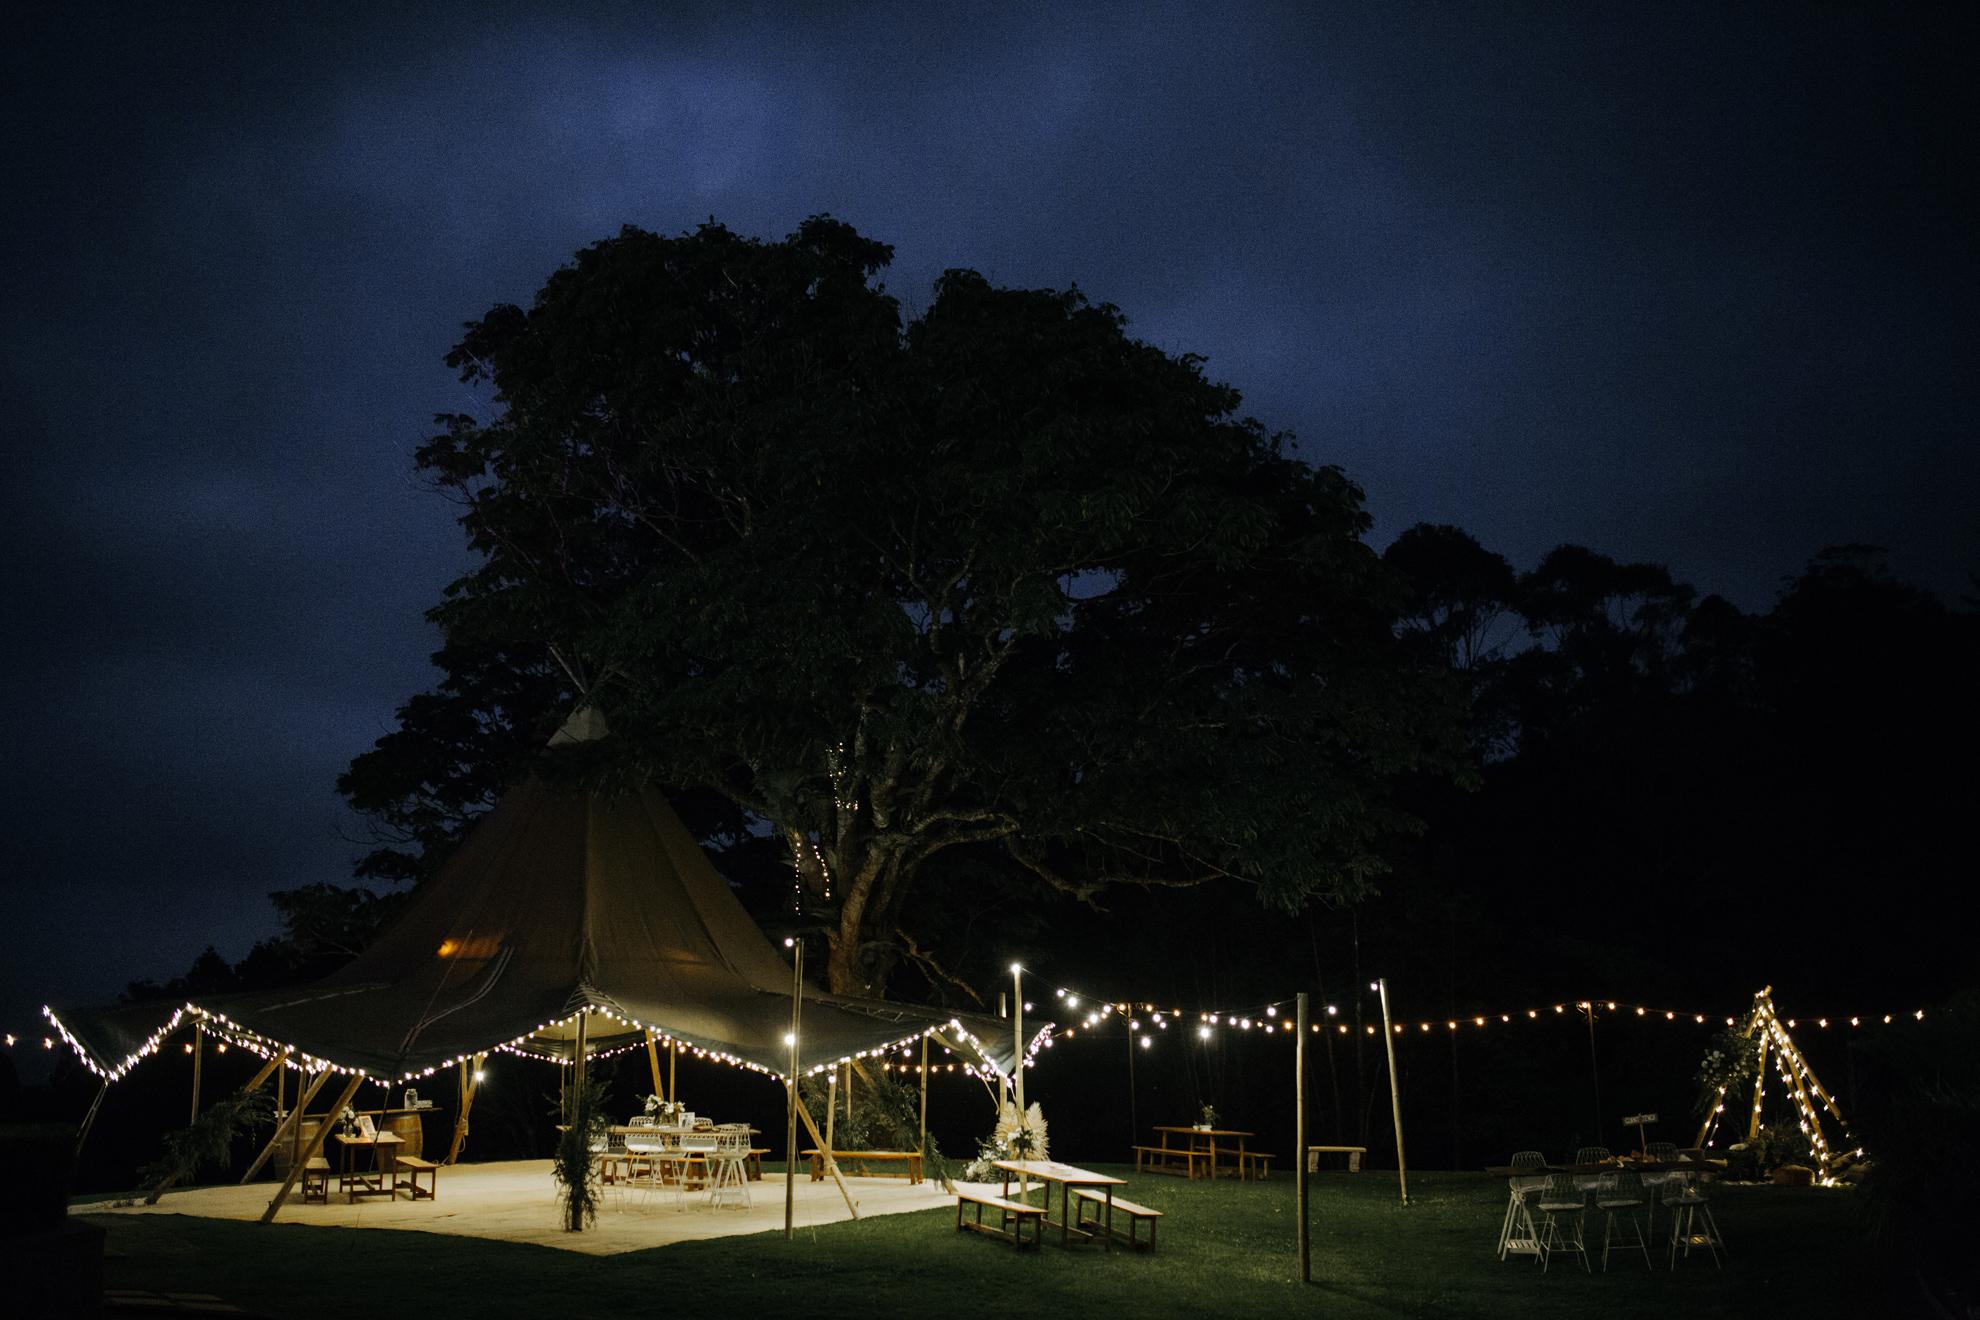 087-Kirby_Lewis_Maleny_Manor_Wedding.jpg